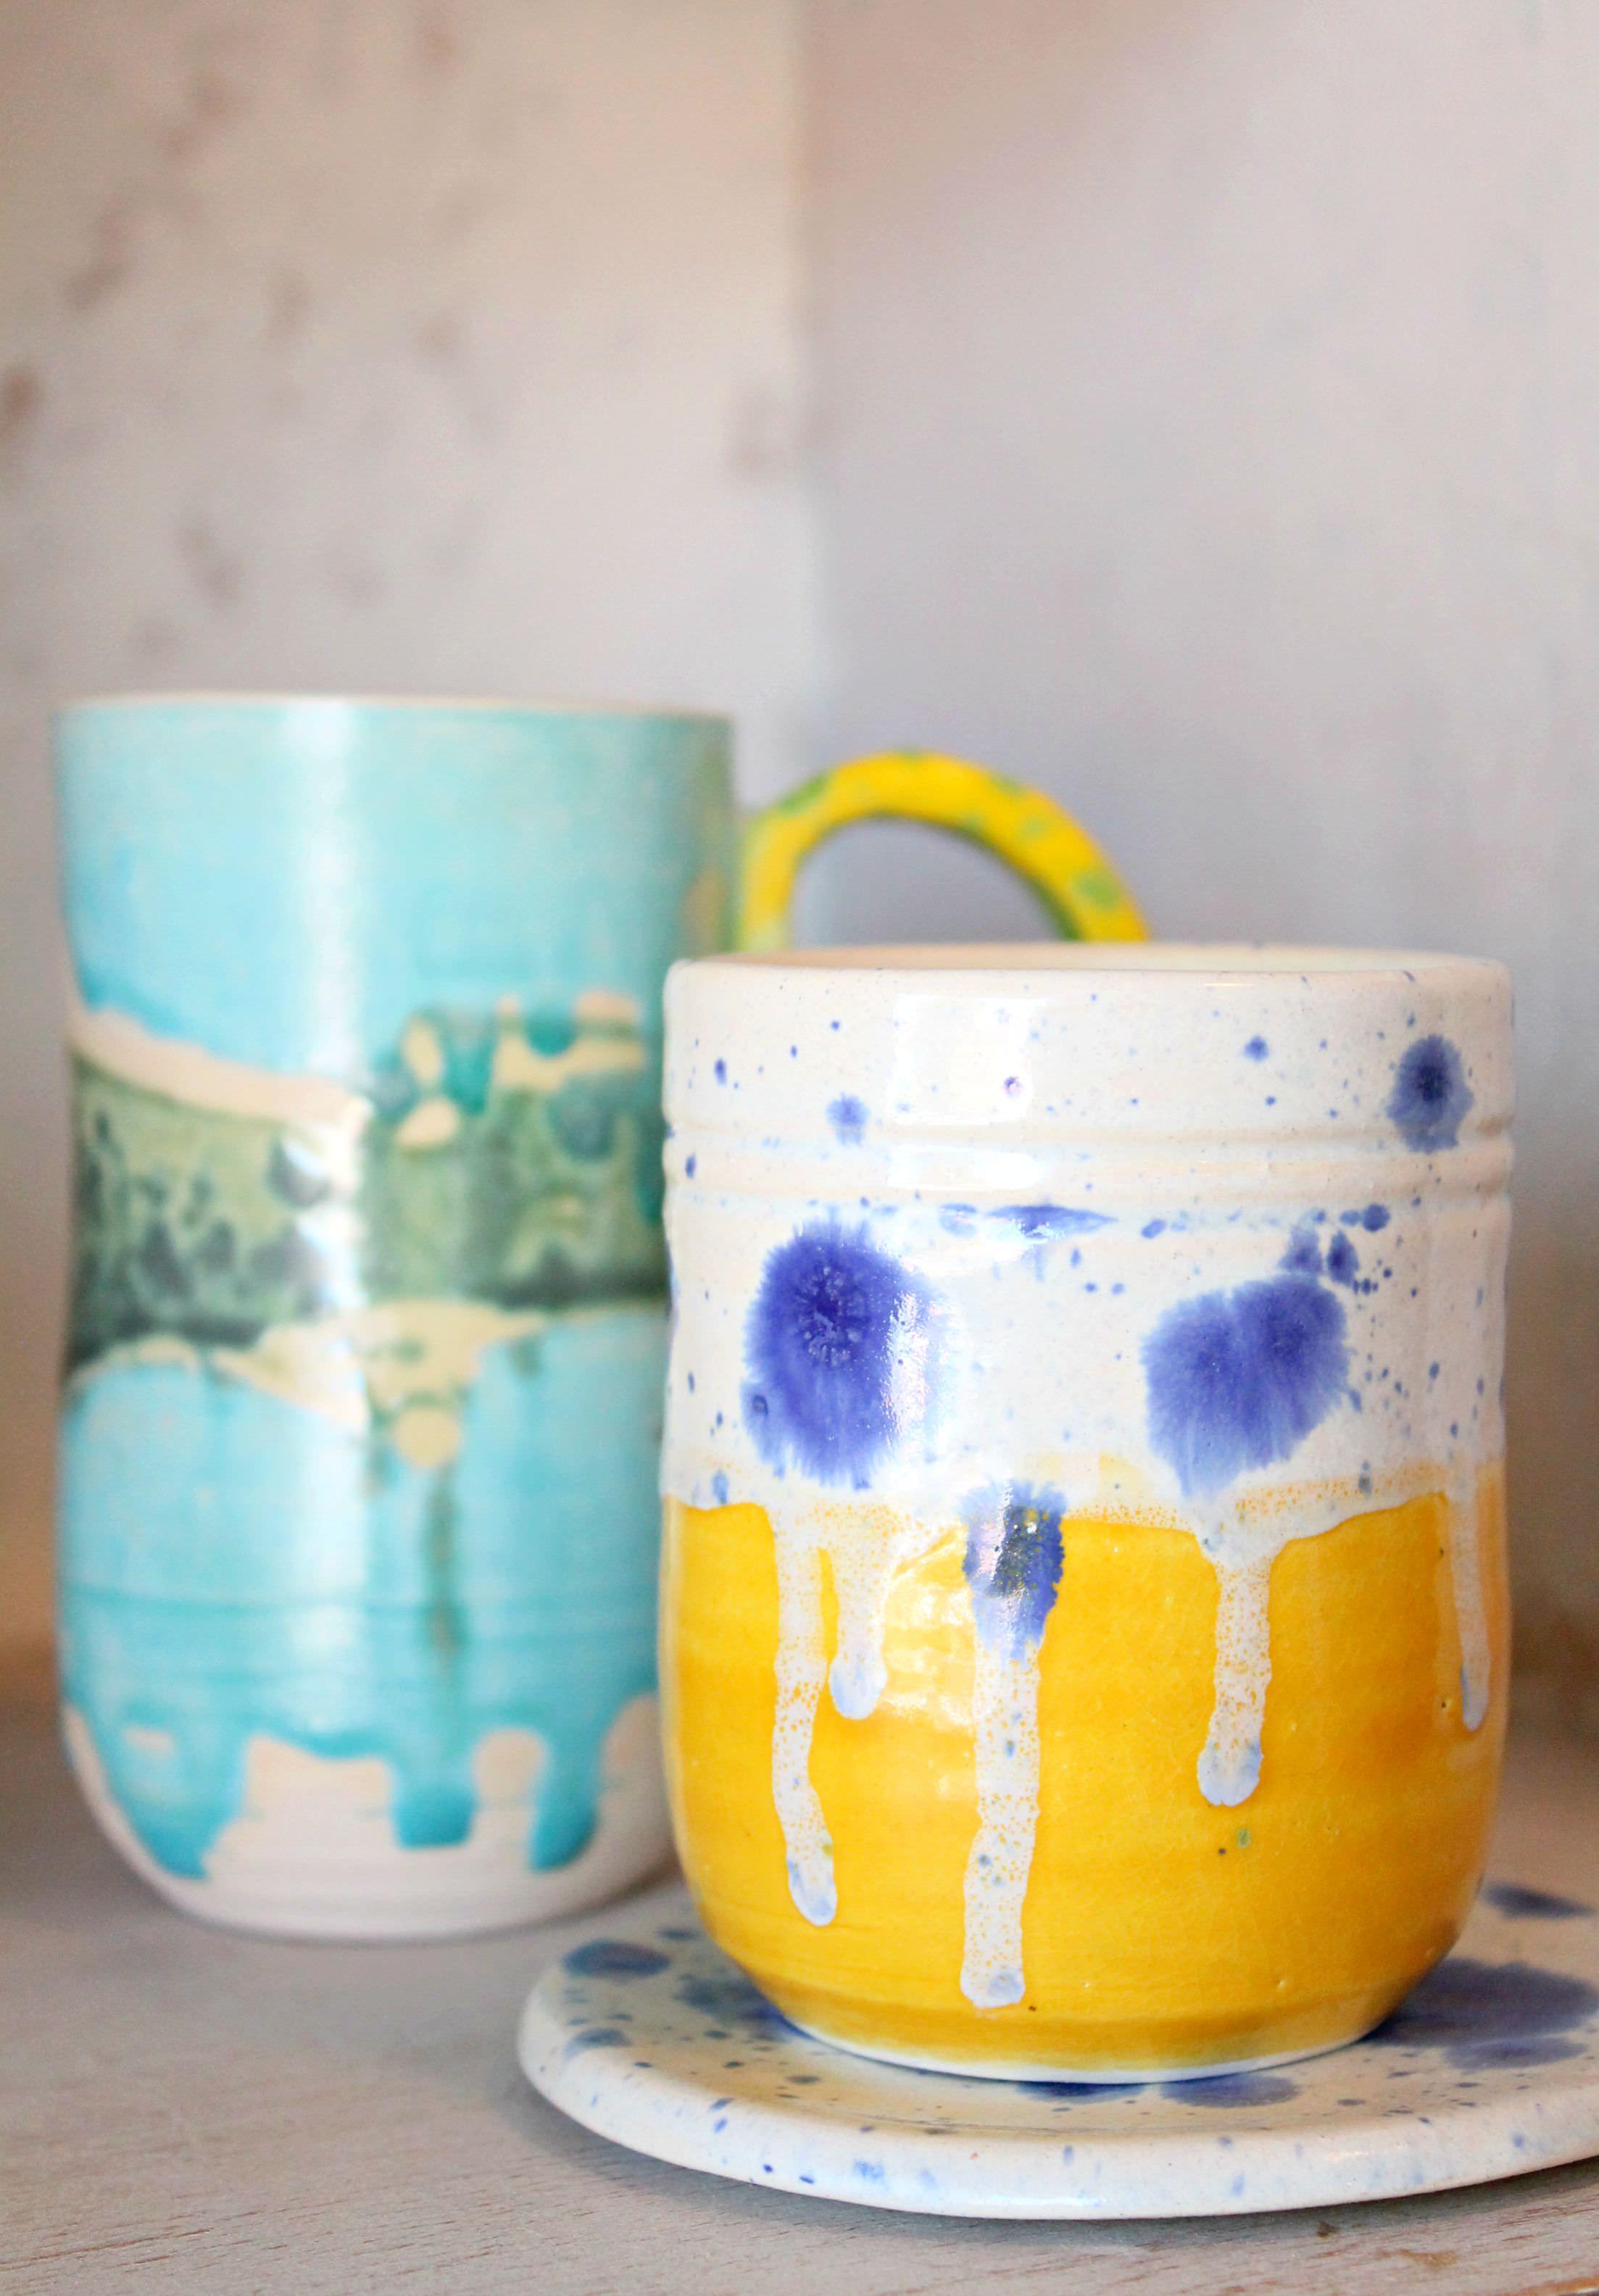 Colourful-ceramics-Eski-Datca-photo-by-Little-Big-Bell